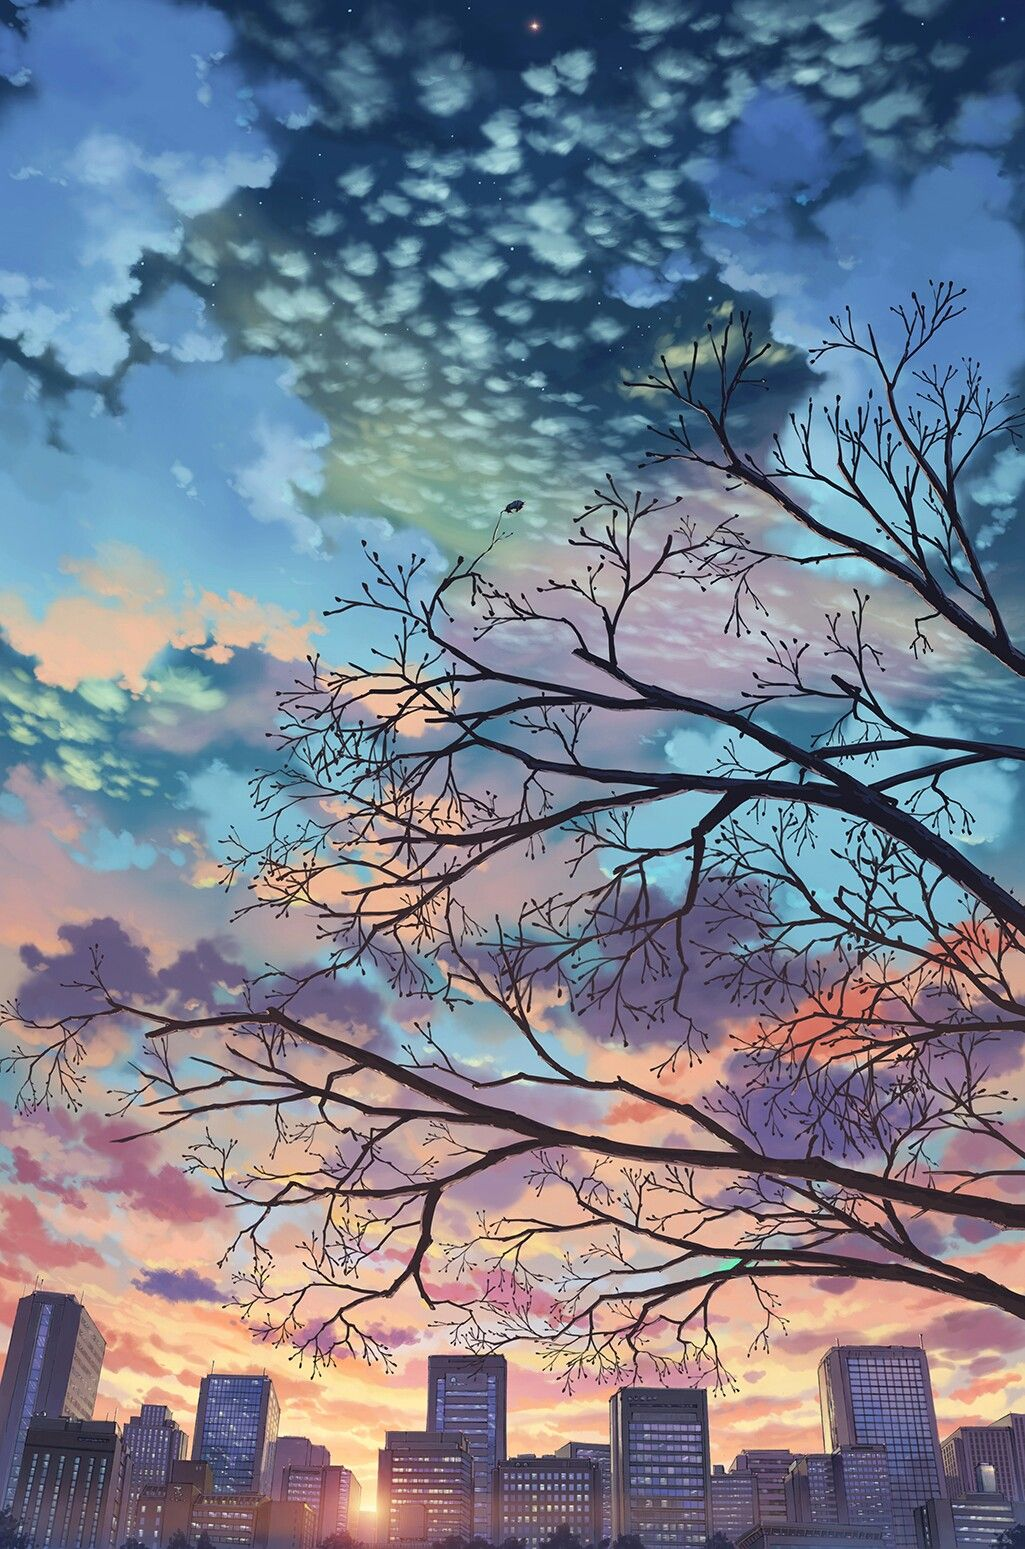 Rainbow Skies 🌈 Anime scenery, Scenery, Anime background